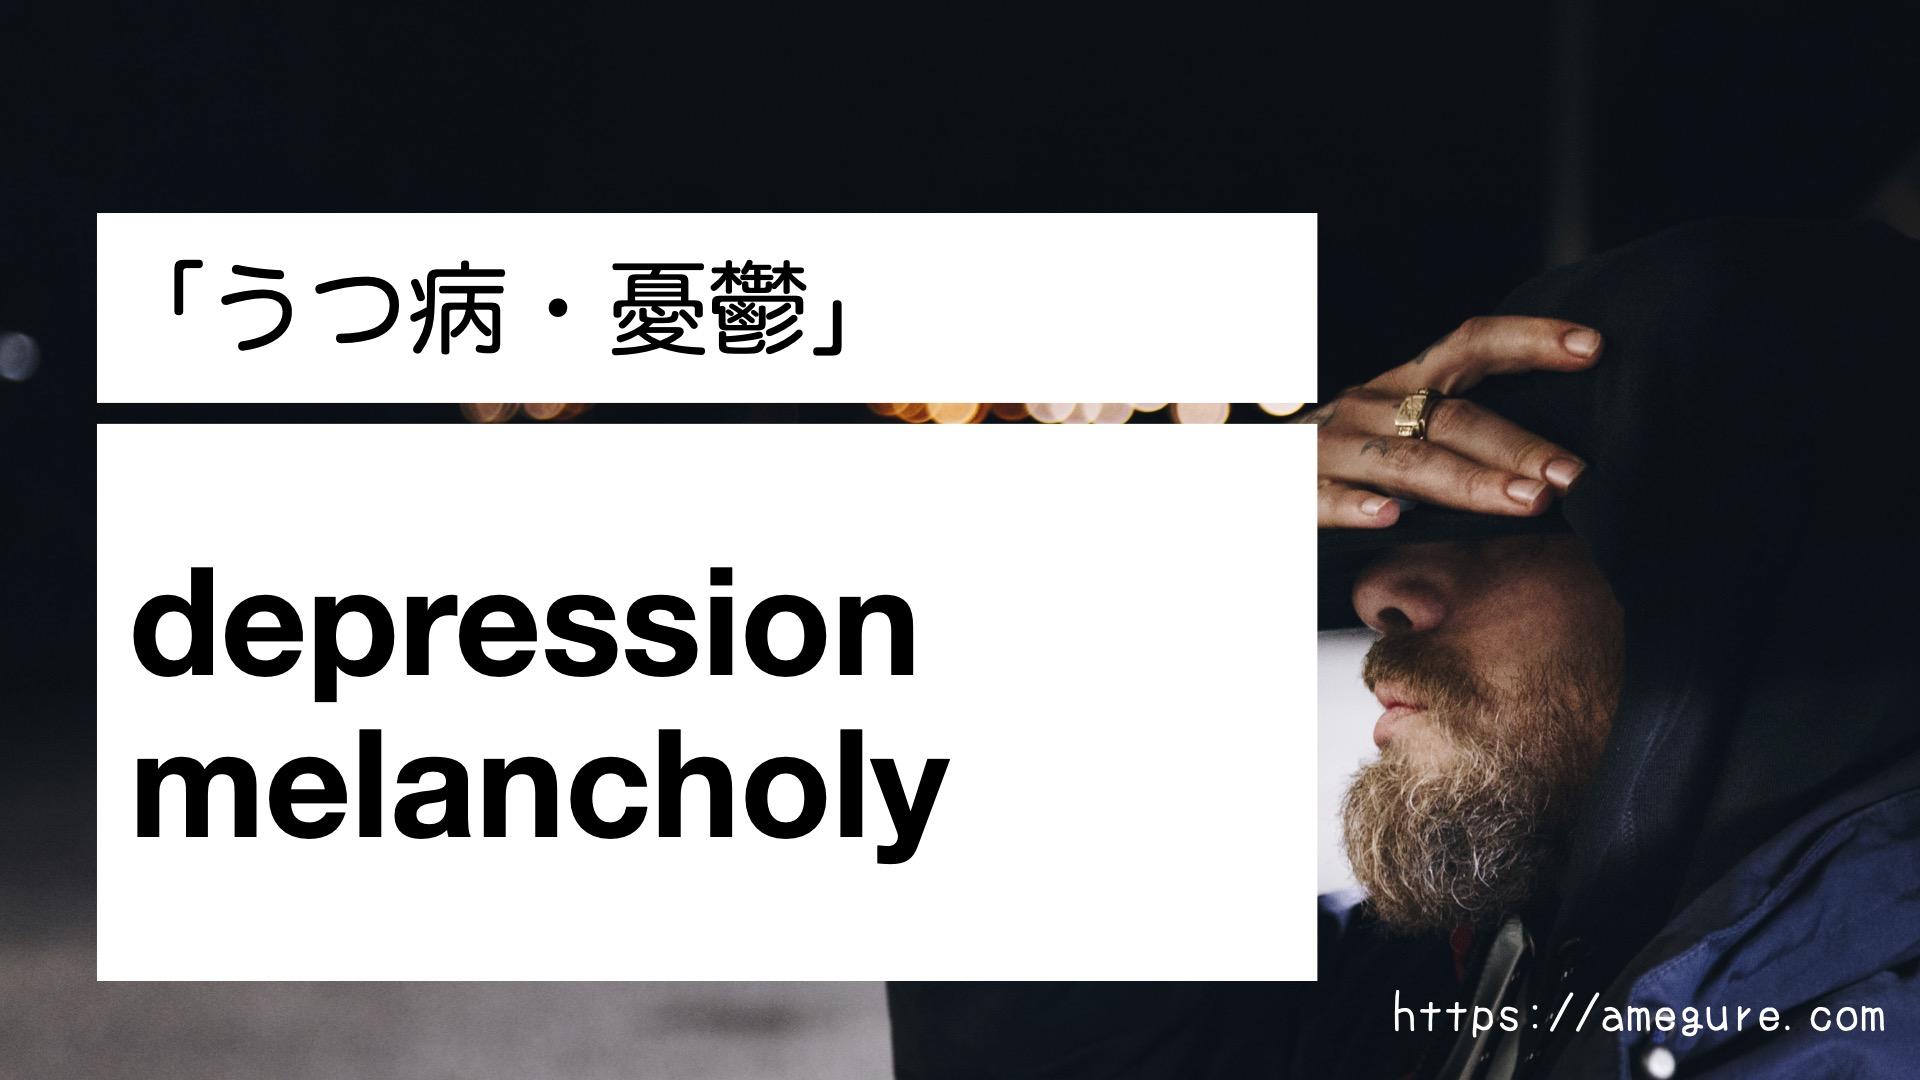 depress-melancholy違い